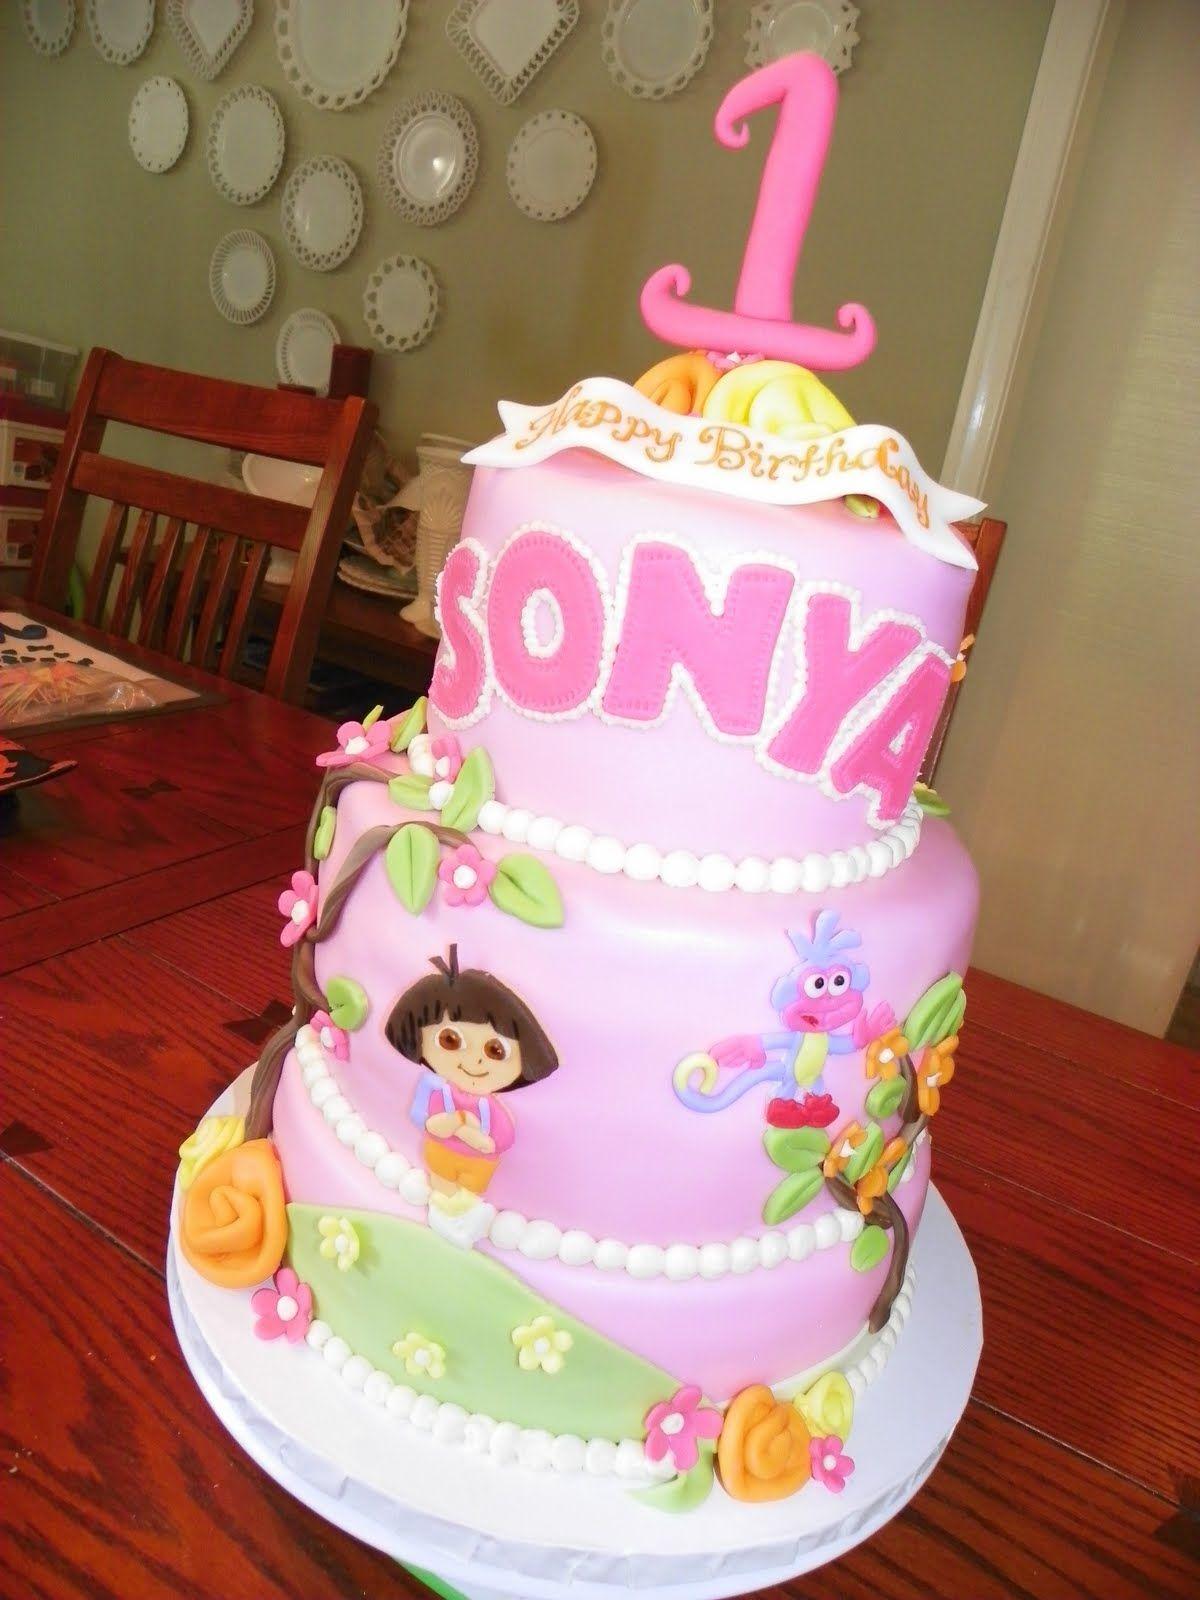 Dora Birthday Cakes Pictures httpmycakedecorscomdorabirthday